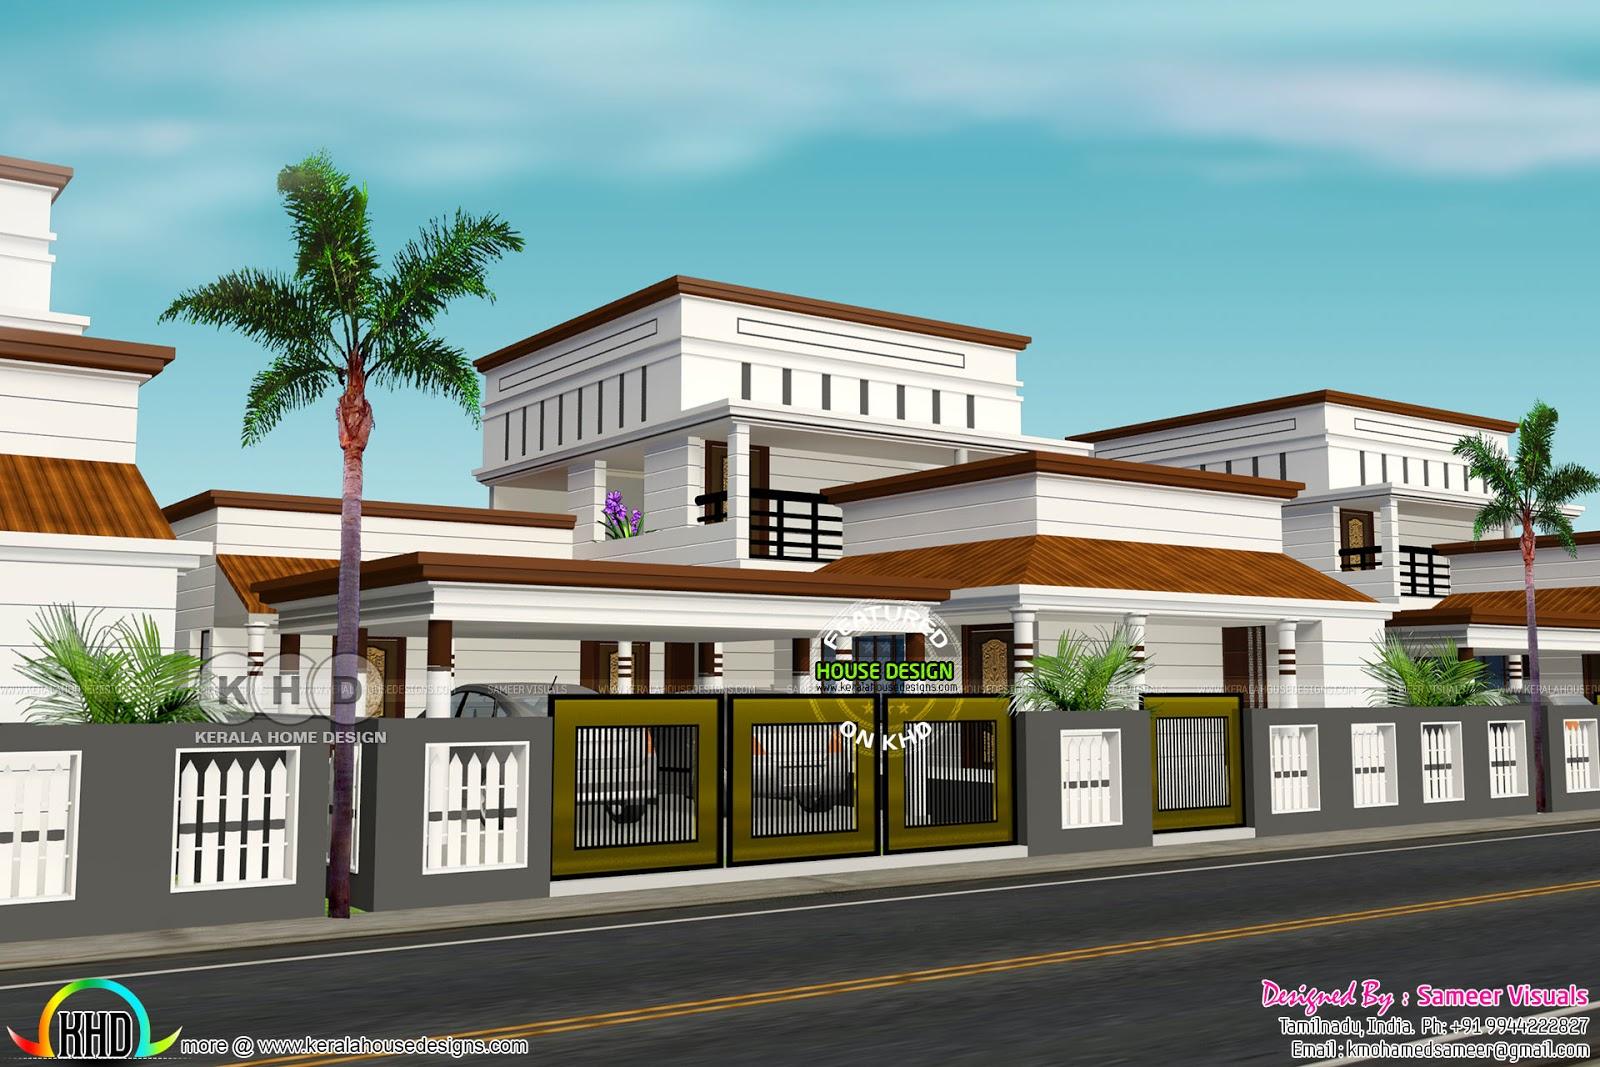 4 Bedroom 2400 Sq Ft Tamilnadu House Kerala Home Design And Floor Plans 8000 Houses